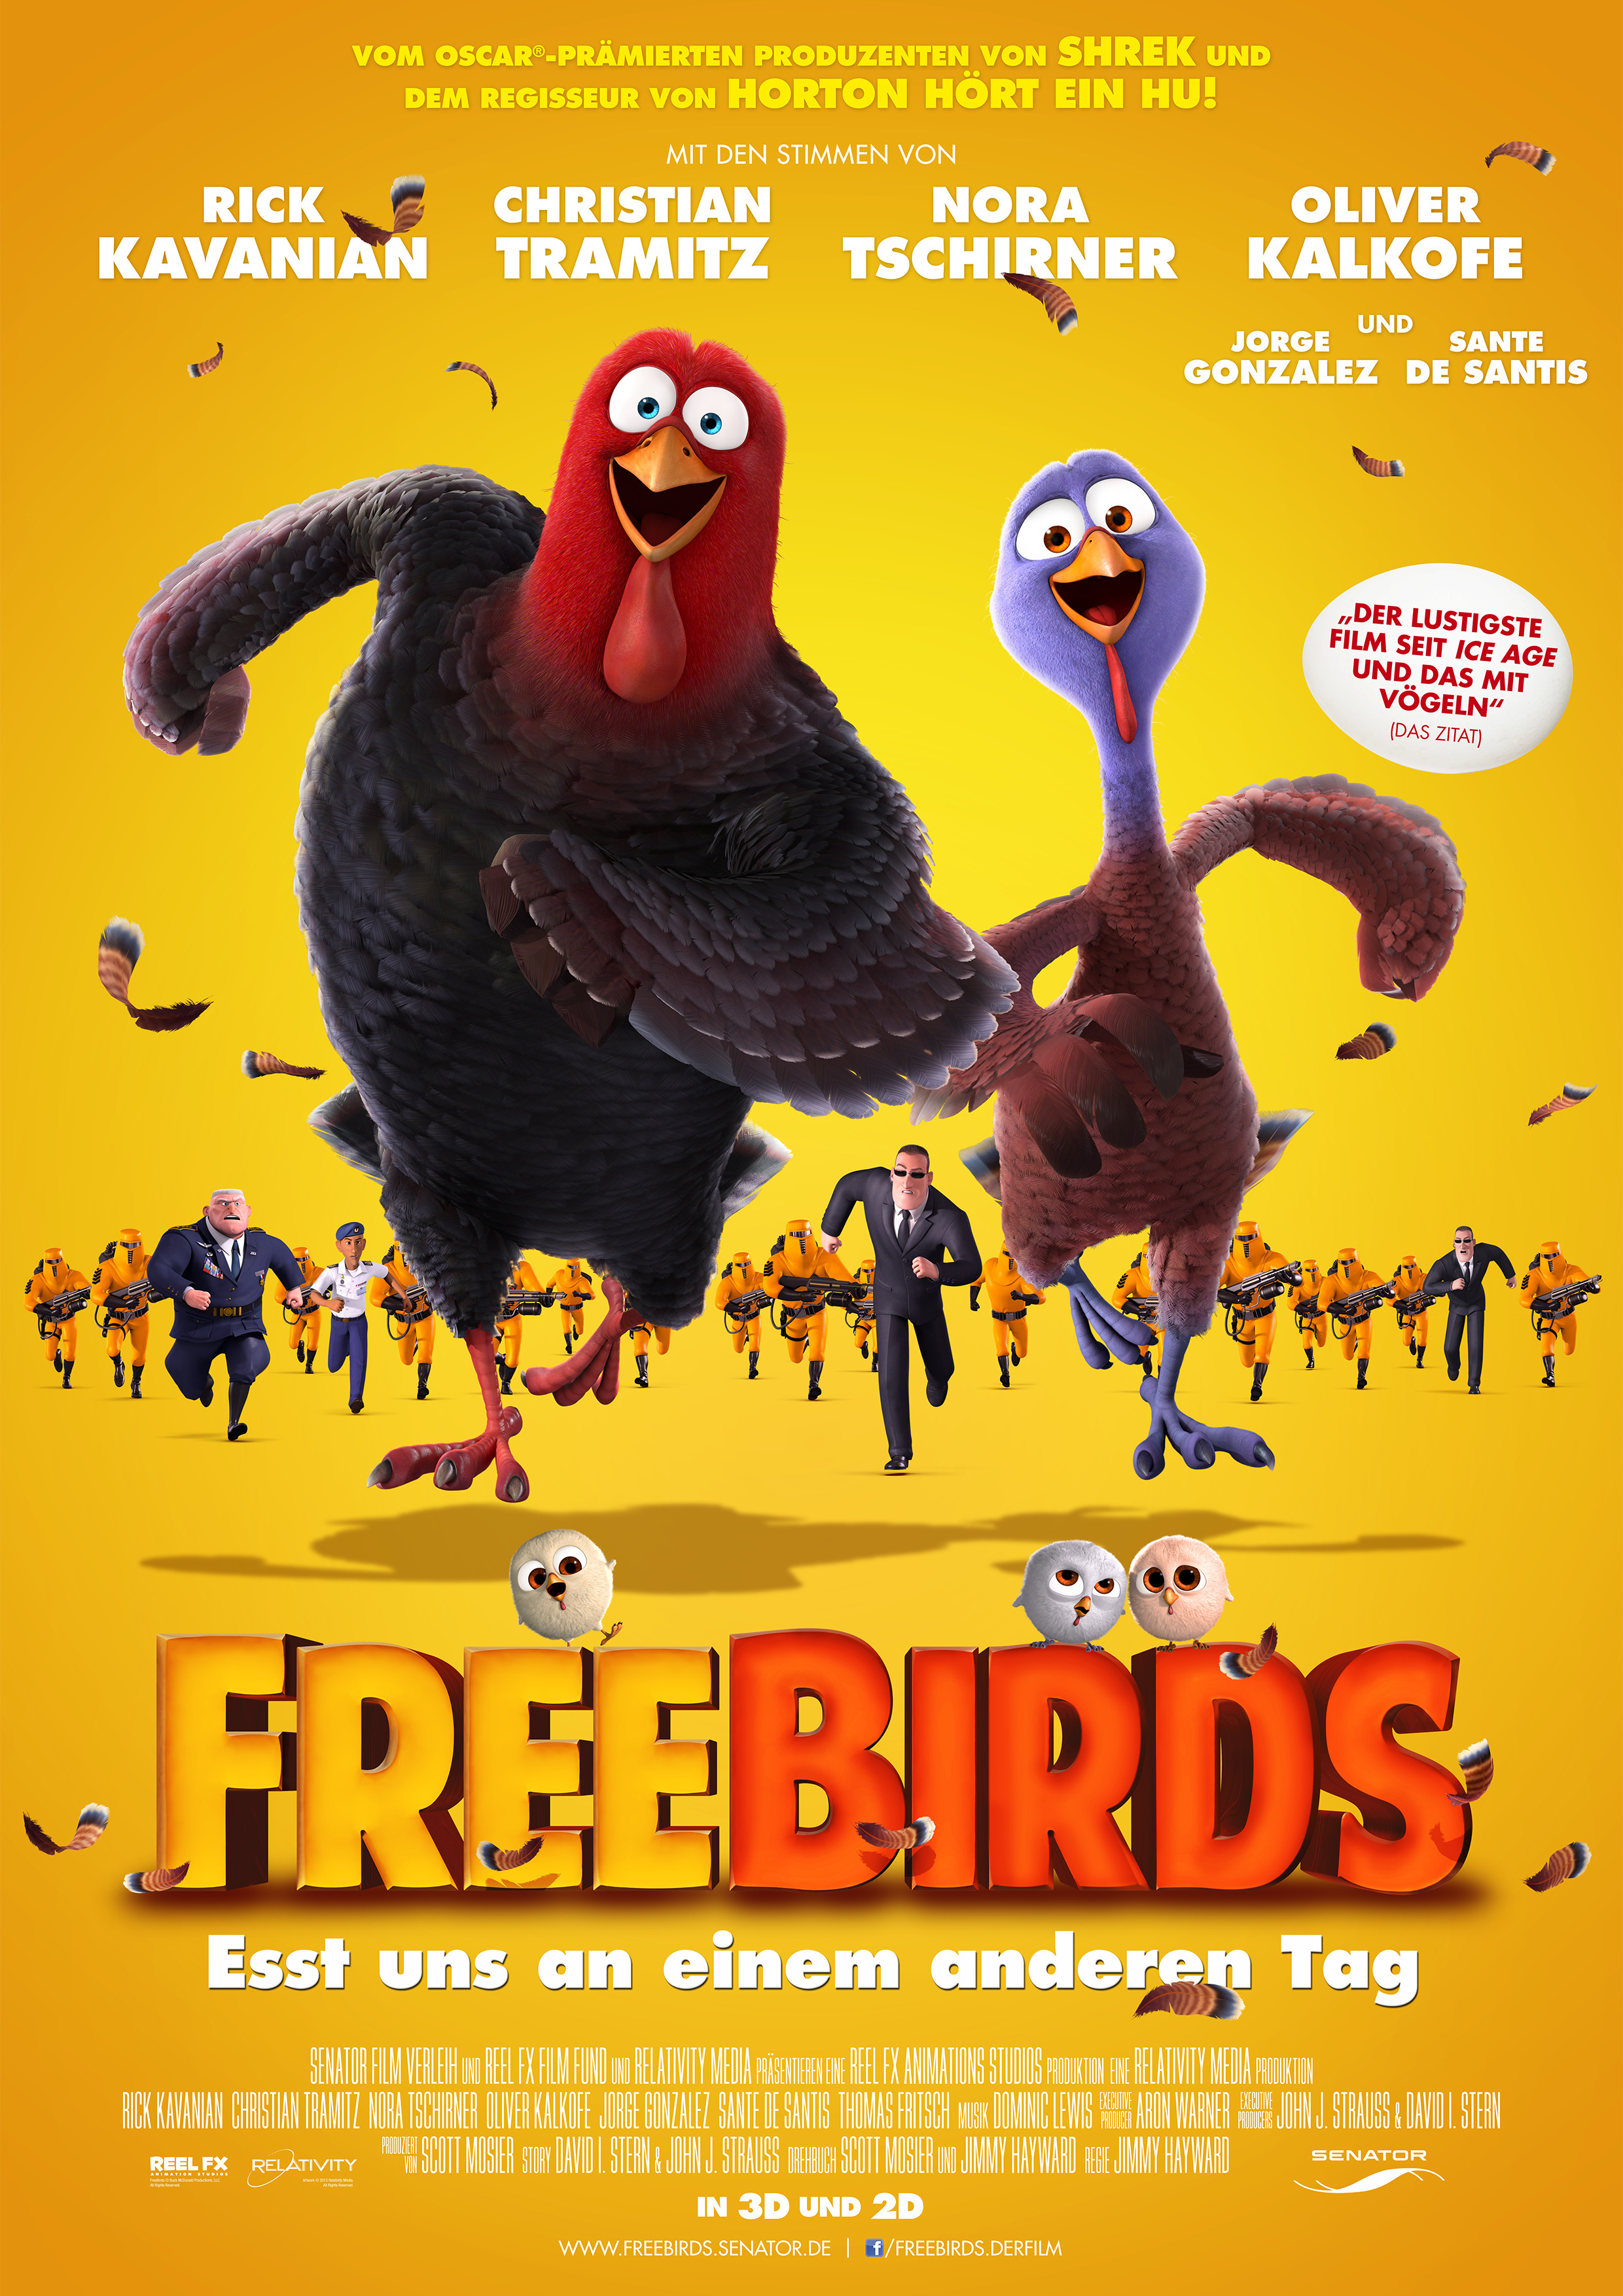 free-birds-poster-1hduys.jpg